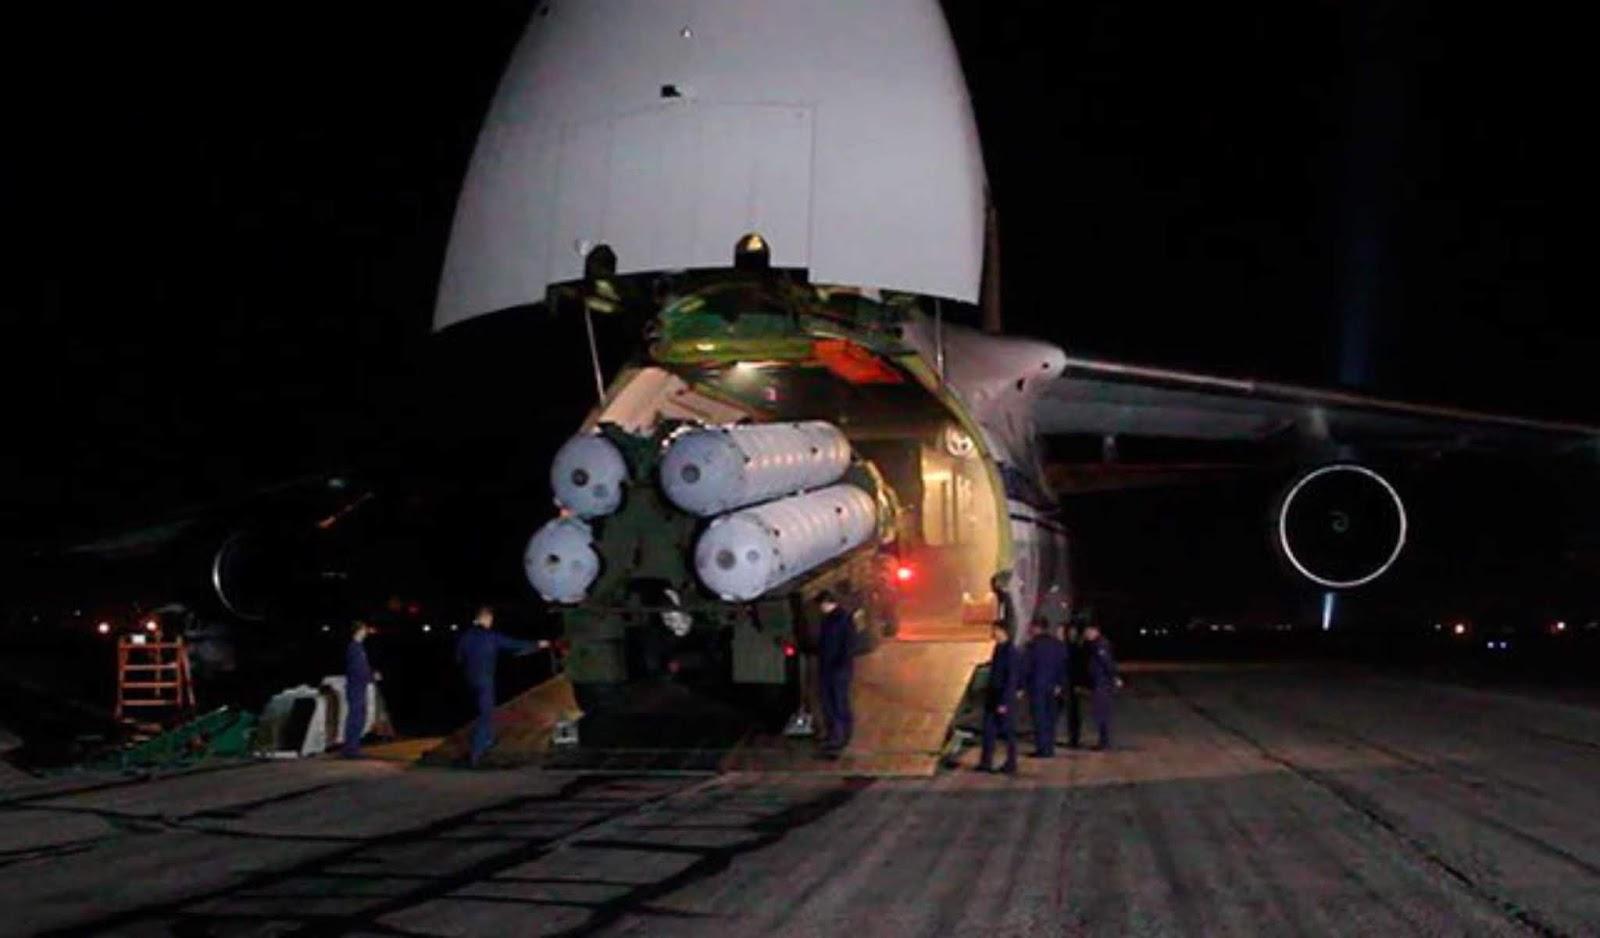 Kementerian Pertahanan Rusia menerbitkan video pembongkaran S-300 di Suriah